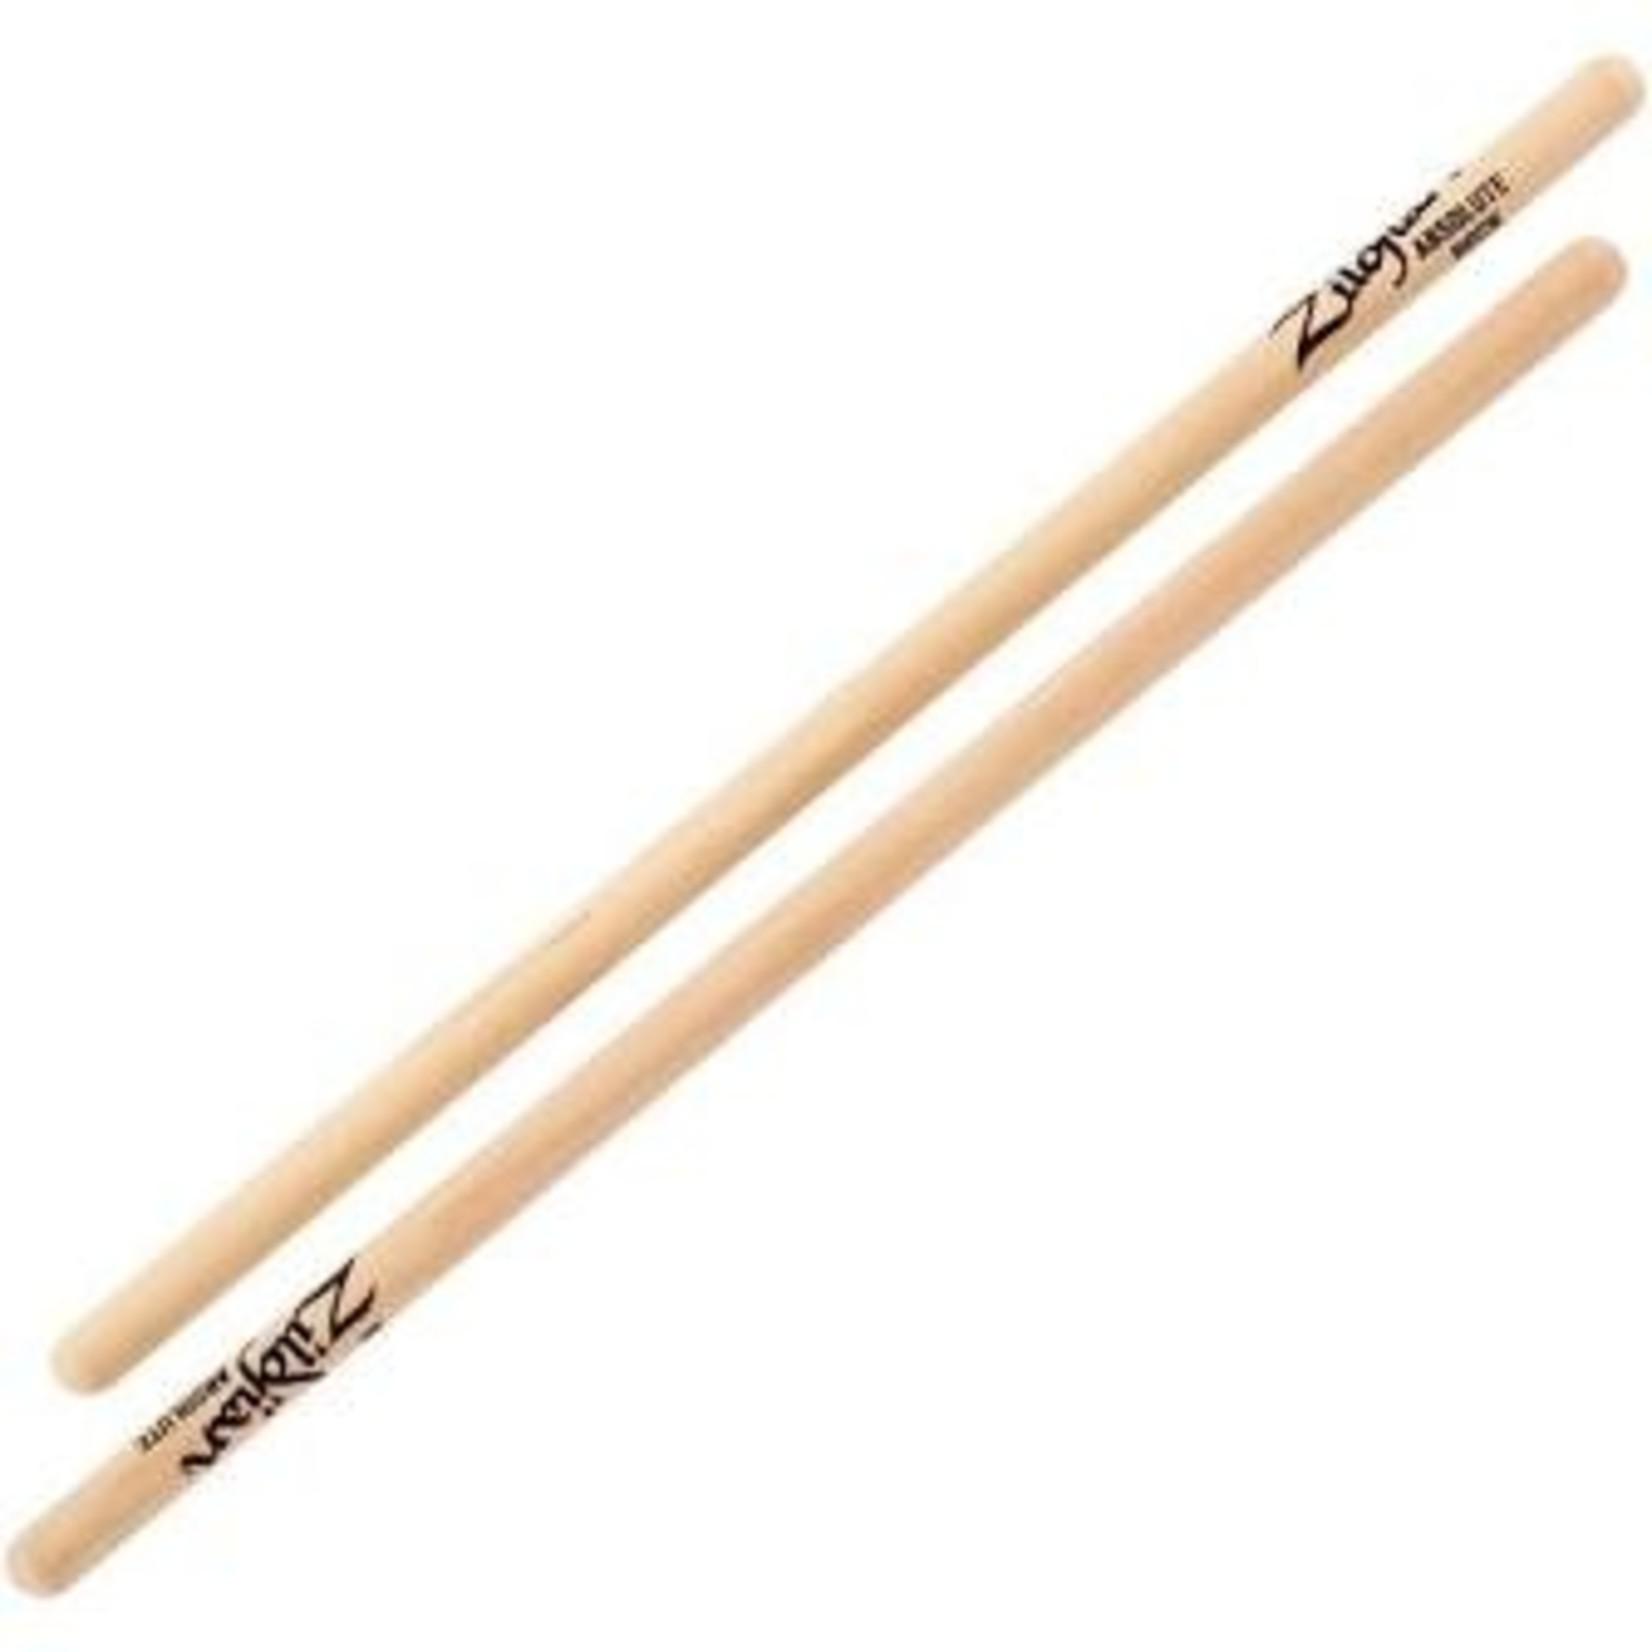 Zildjian Zildjian Absolute Rock Drumsticks